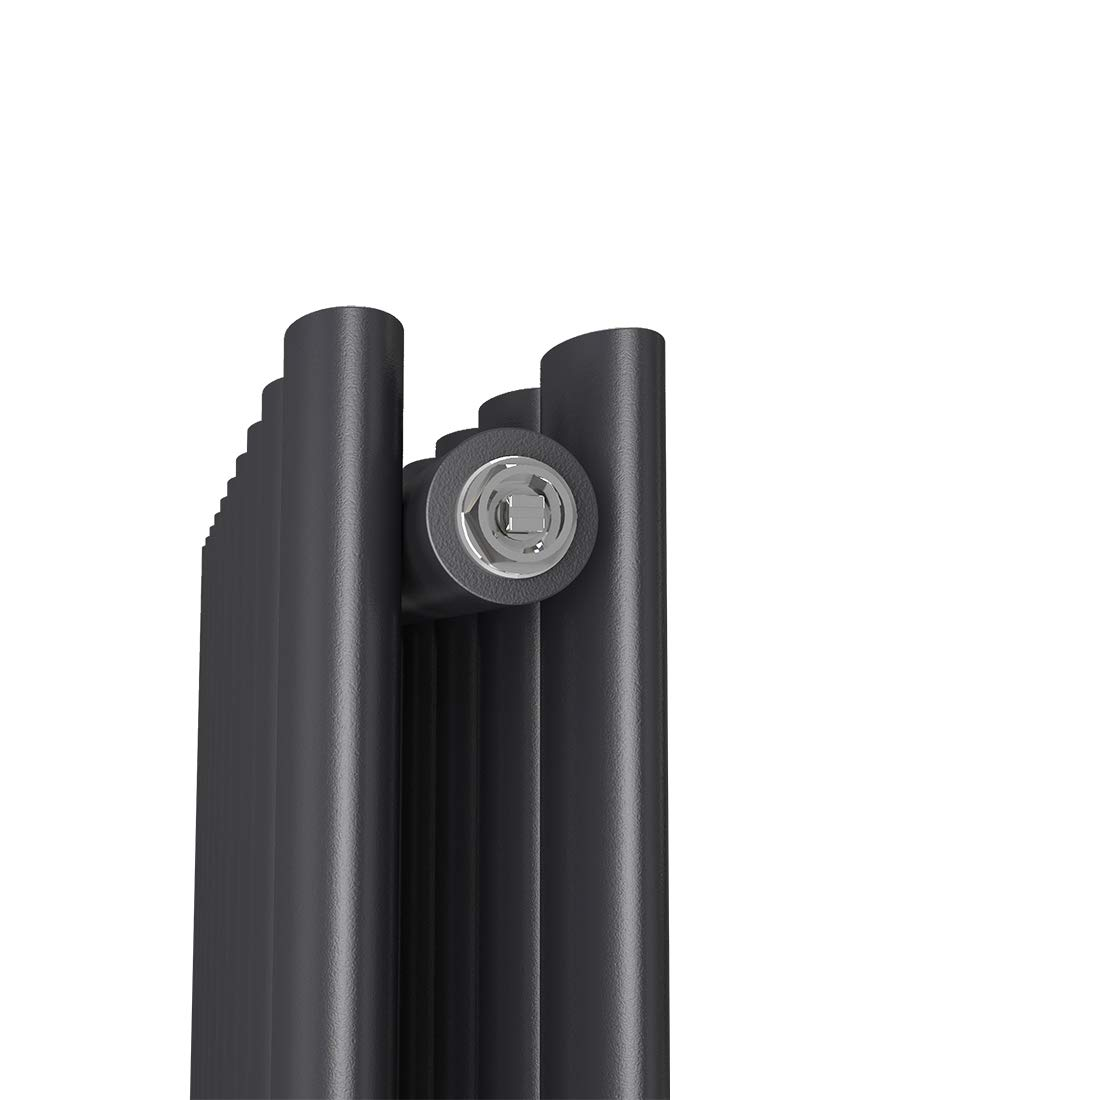 Design Oval Heizk/örper Design Horizontaler Paneelheizk/örper 600 x 770 mm Wei/ß Heizung Seitenanschluss Doppellagig